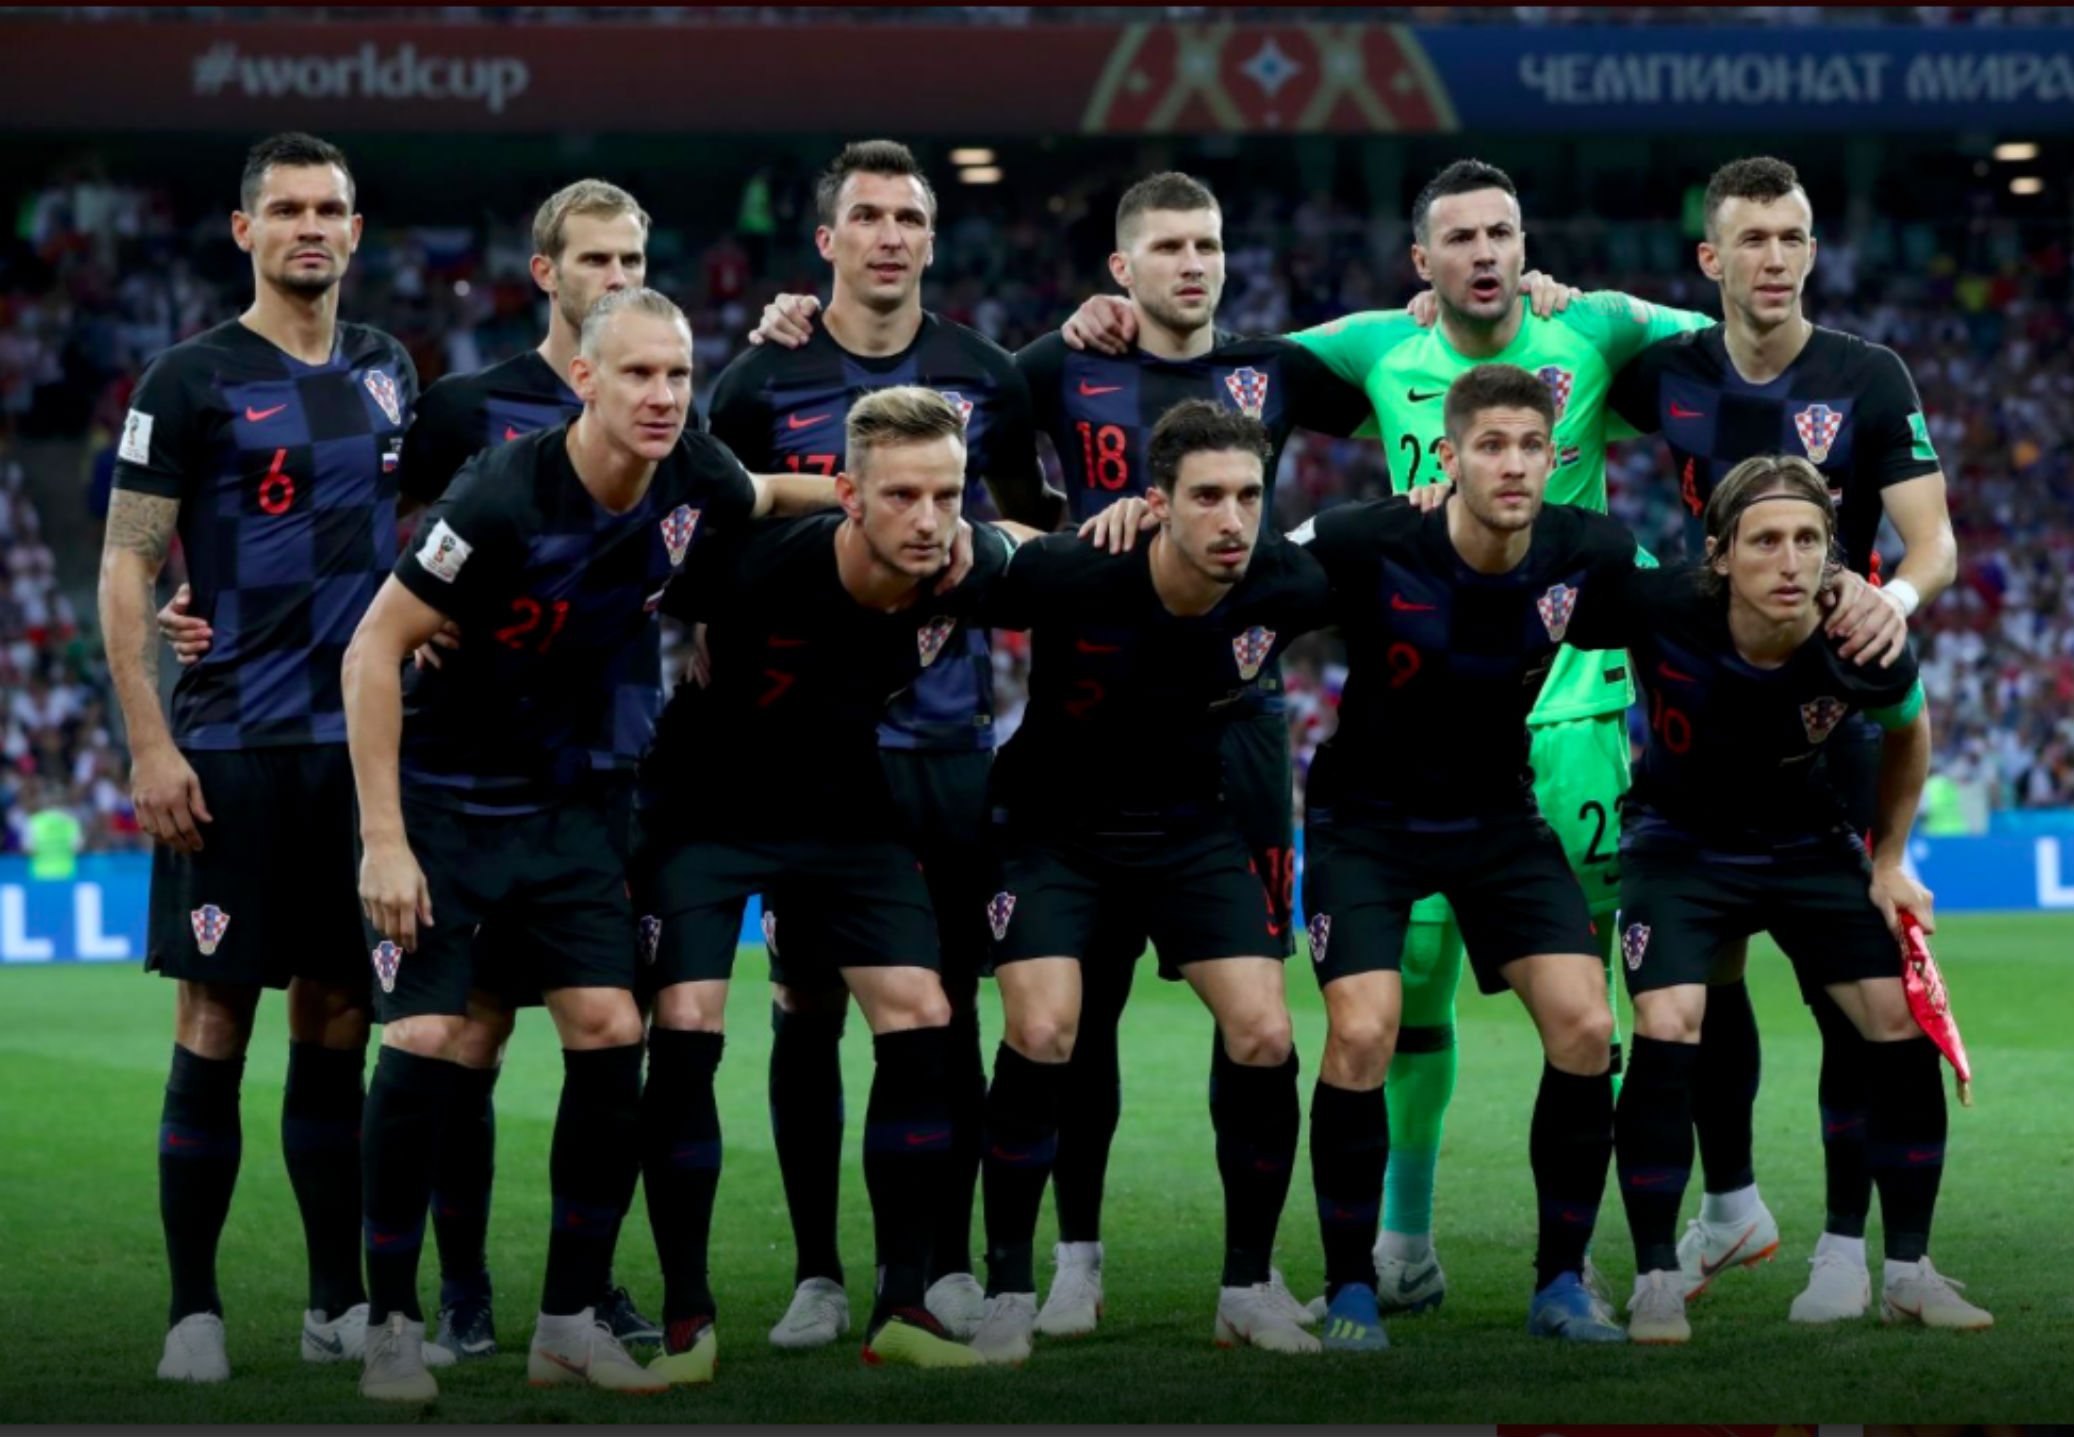 Fifa World Cup 2018 Australians To Support Croatia In Semi Final